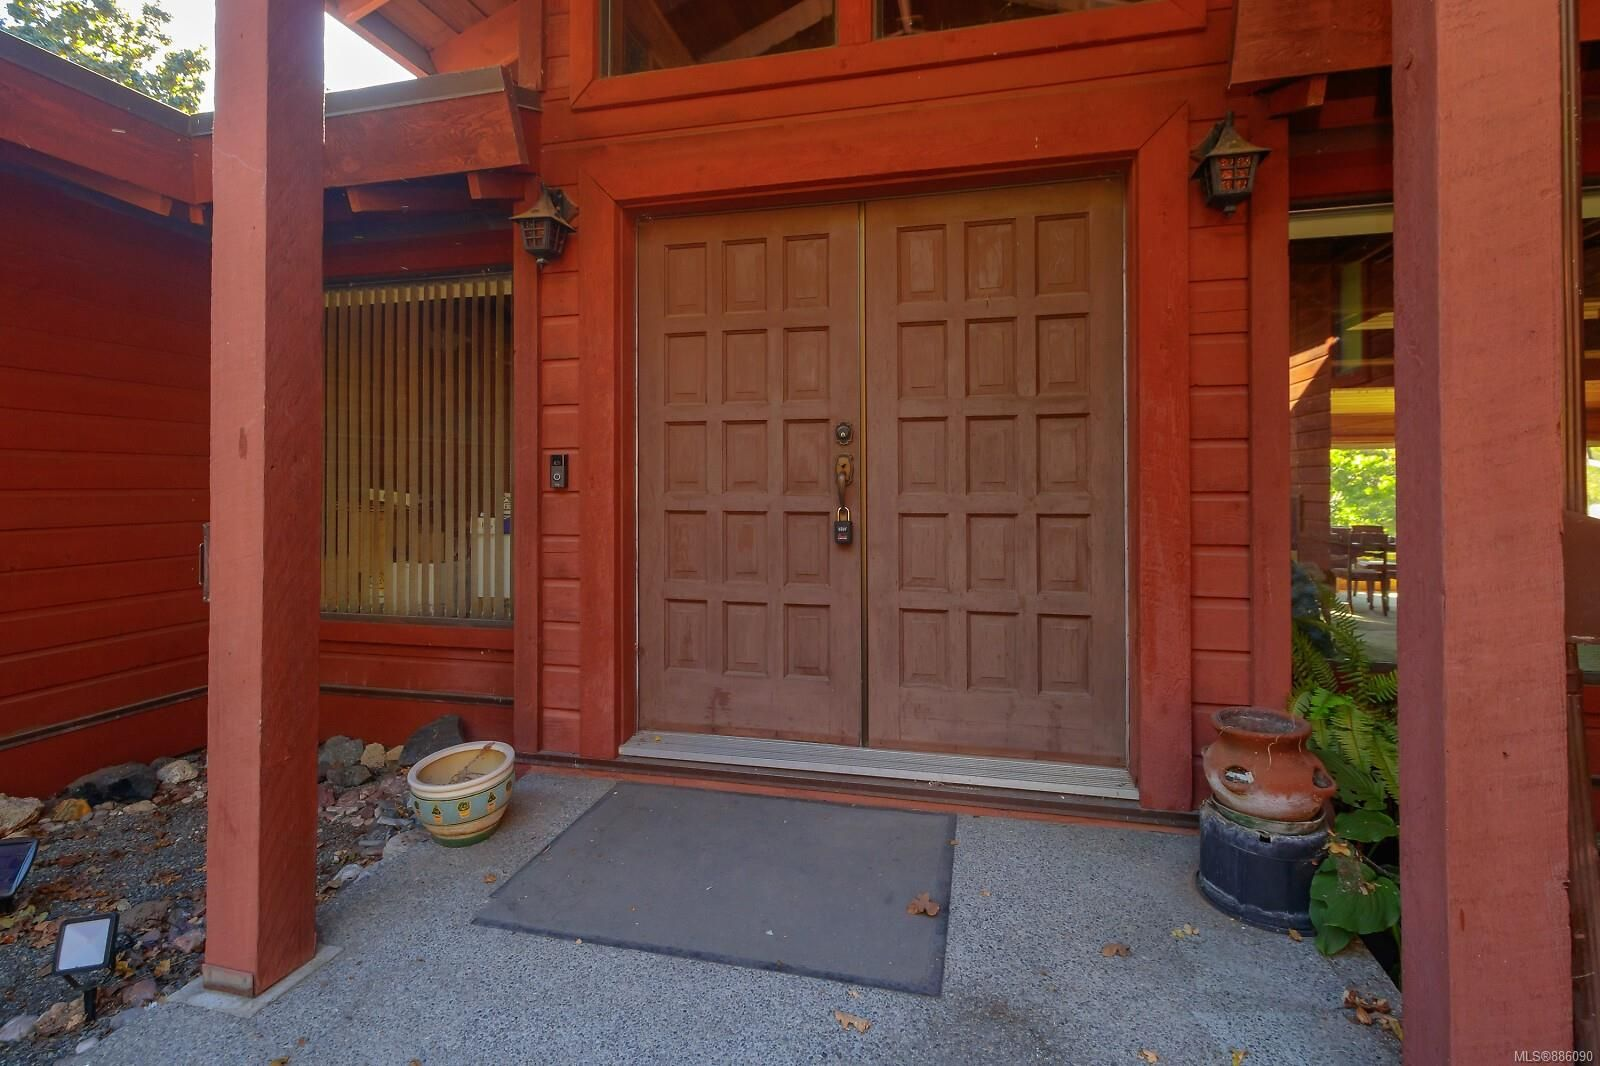 Photo 7: Photos: 4553 Blenkinsop Rd in : SE Blenkinsop House for sale (Saanich East)  : MLS®# 886090